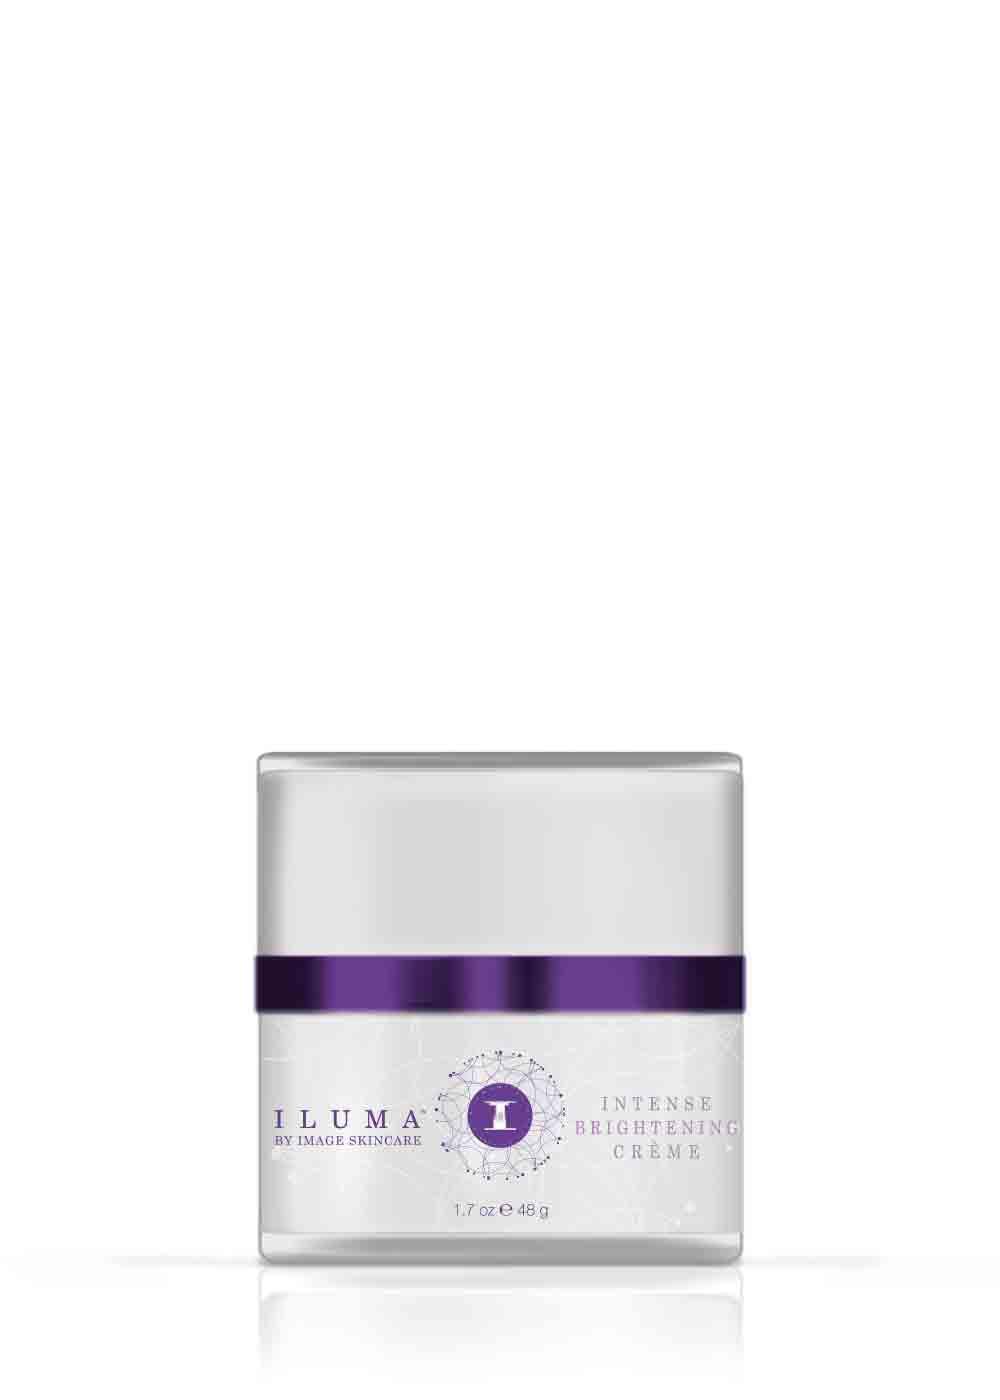 iluma intense brightening creme